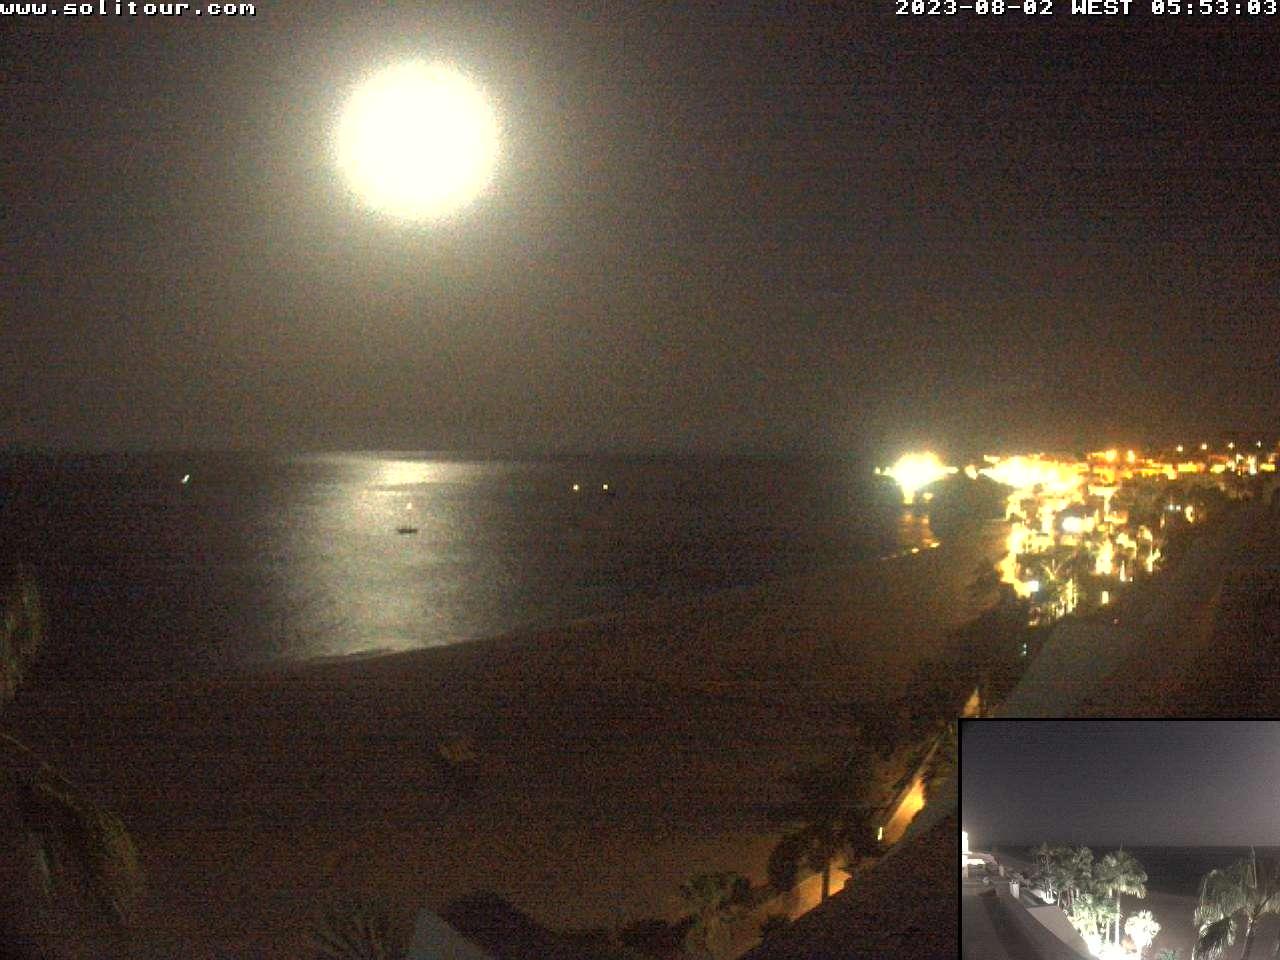 Jandia (Fuerteventura) Fri. 05:53